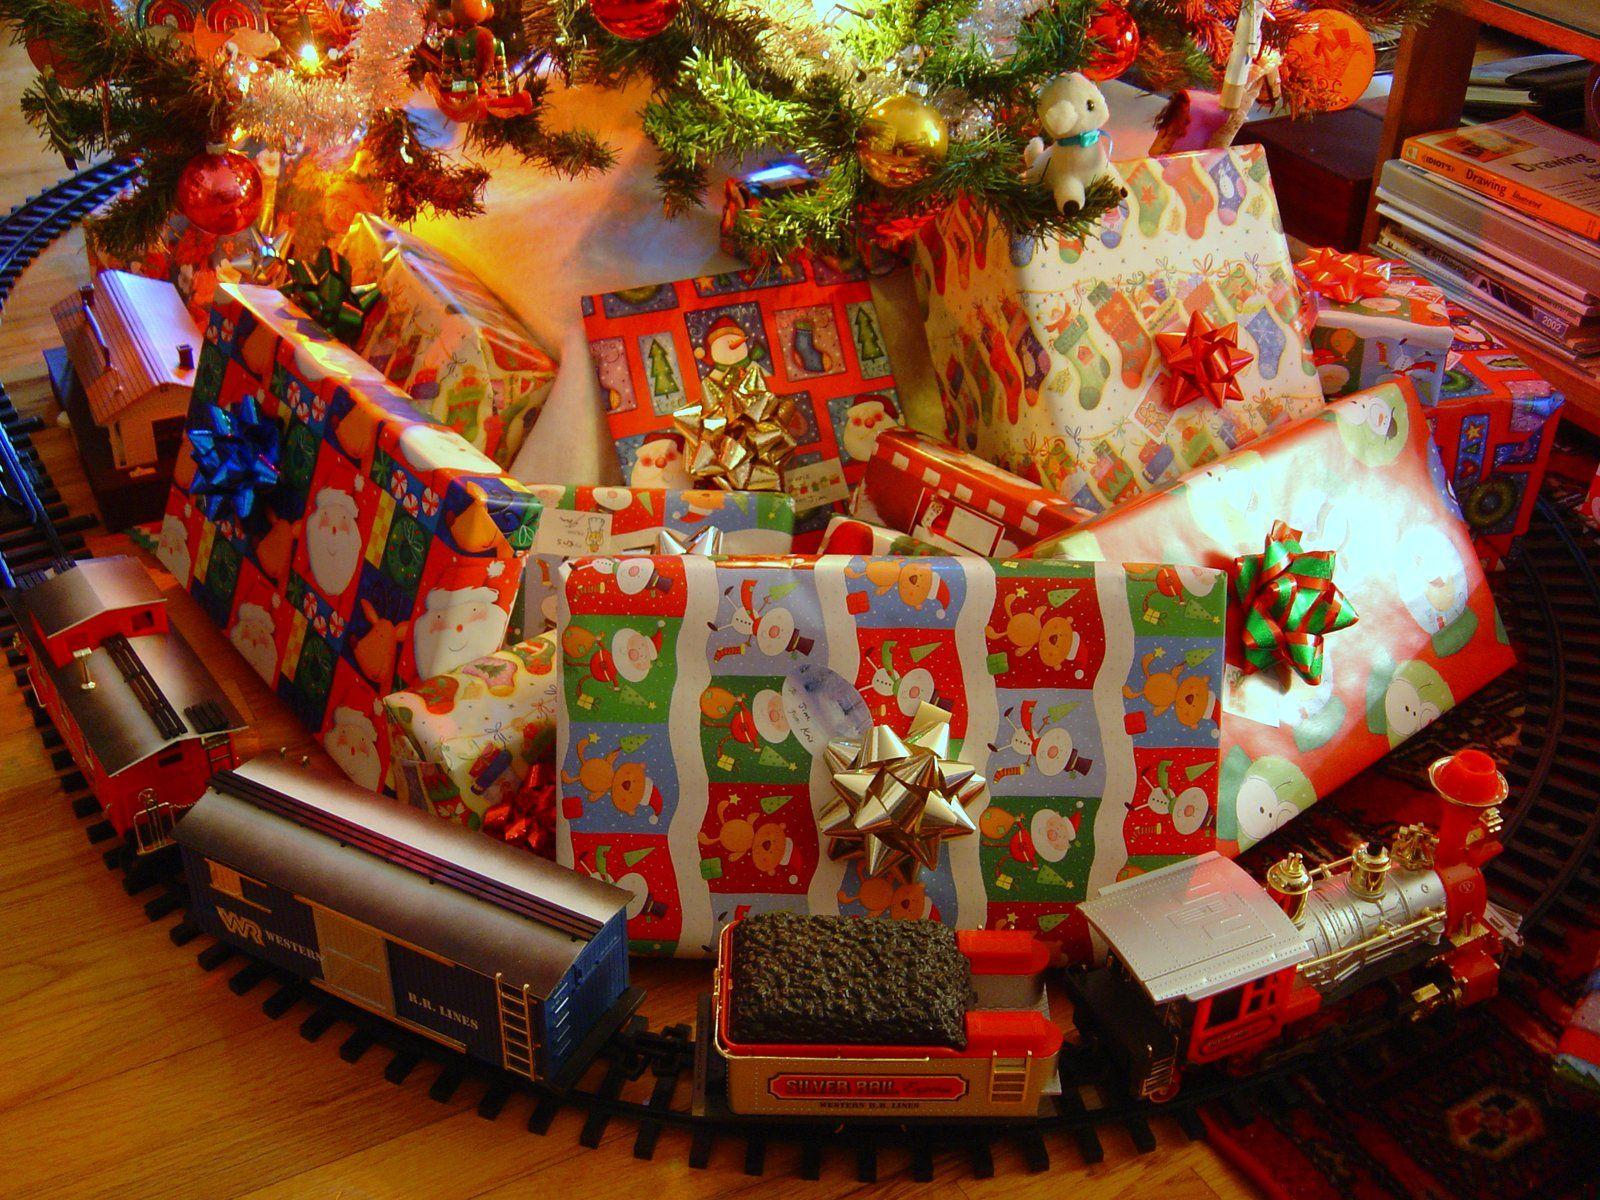 toy train running under a christmas tree :-) | Train under ...